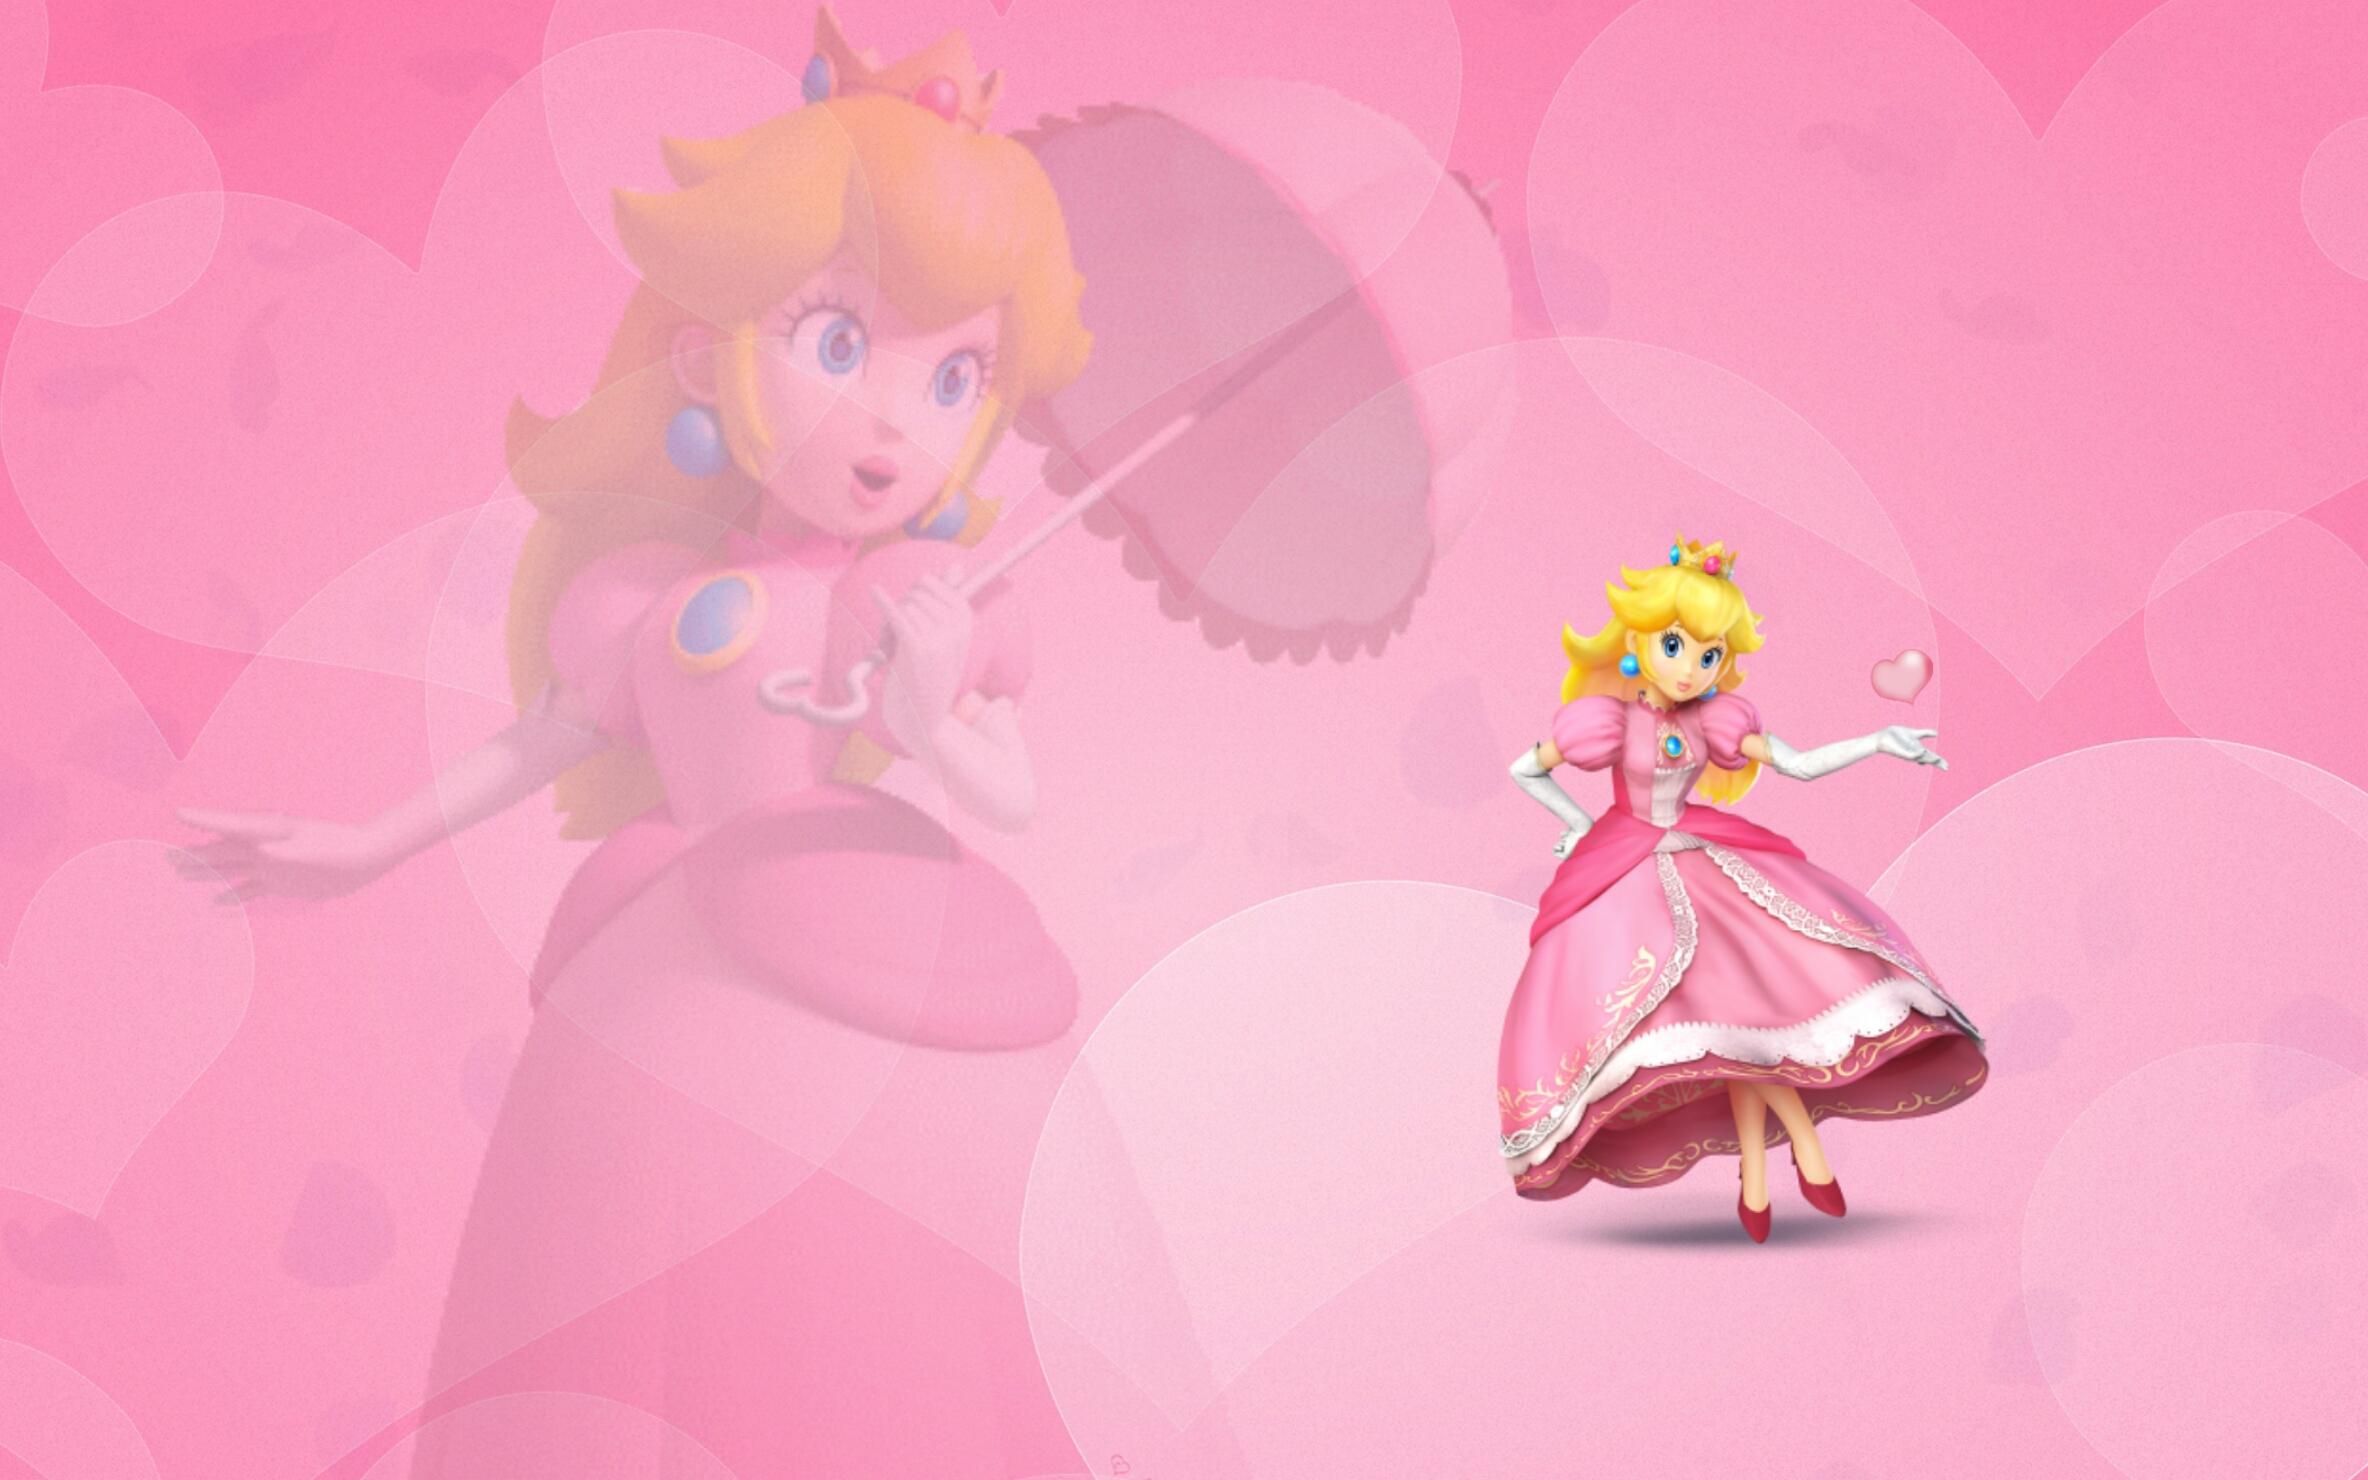 Princess Peach wallpaper by L-yre